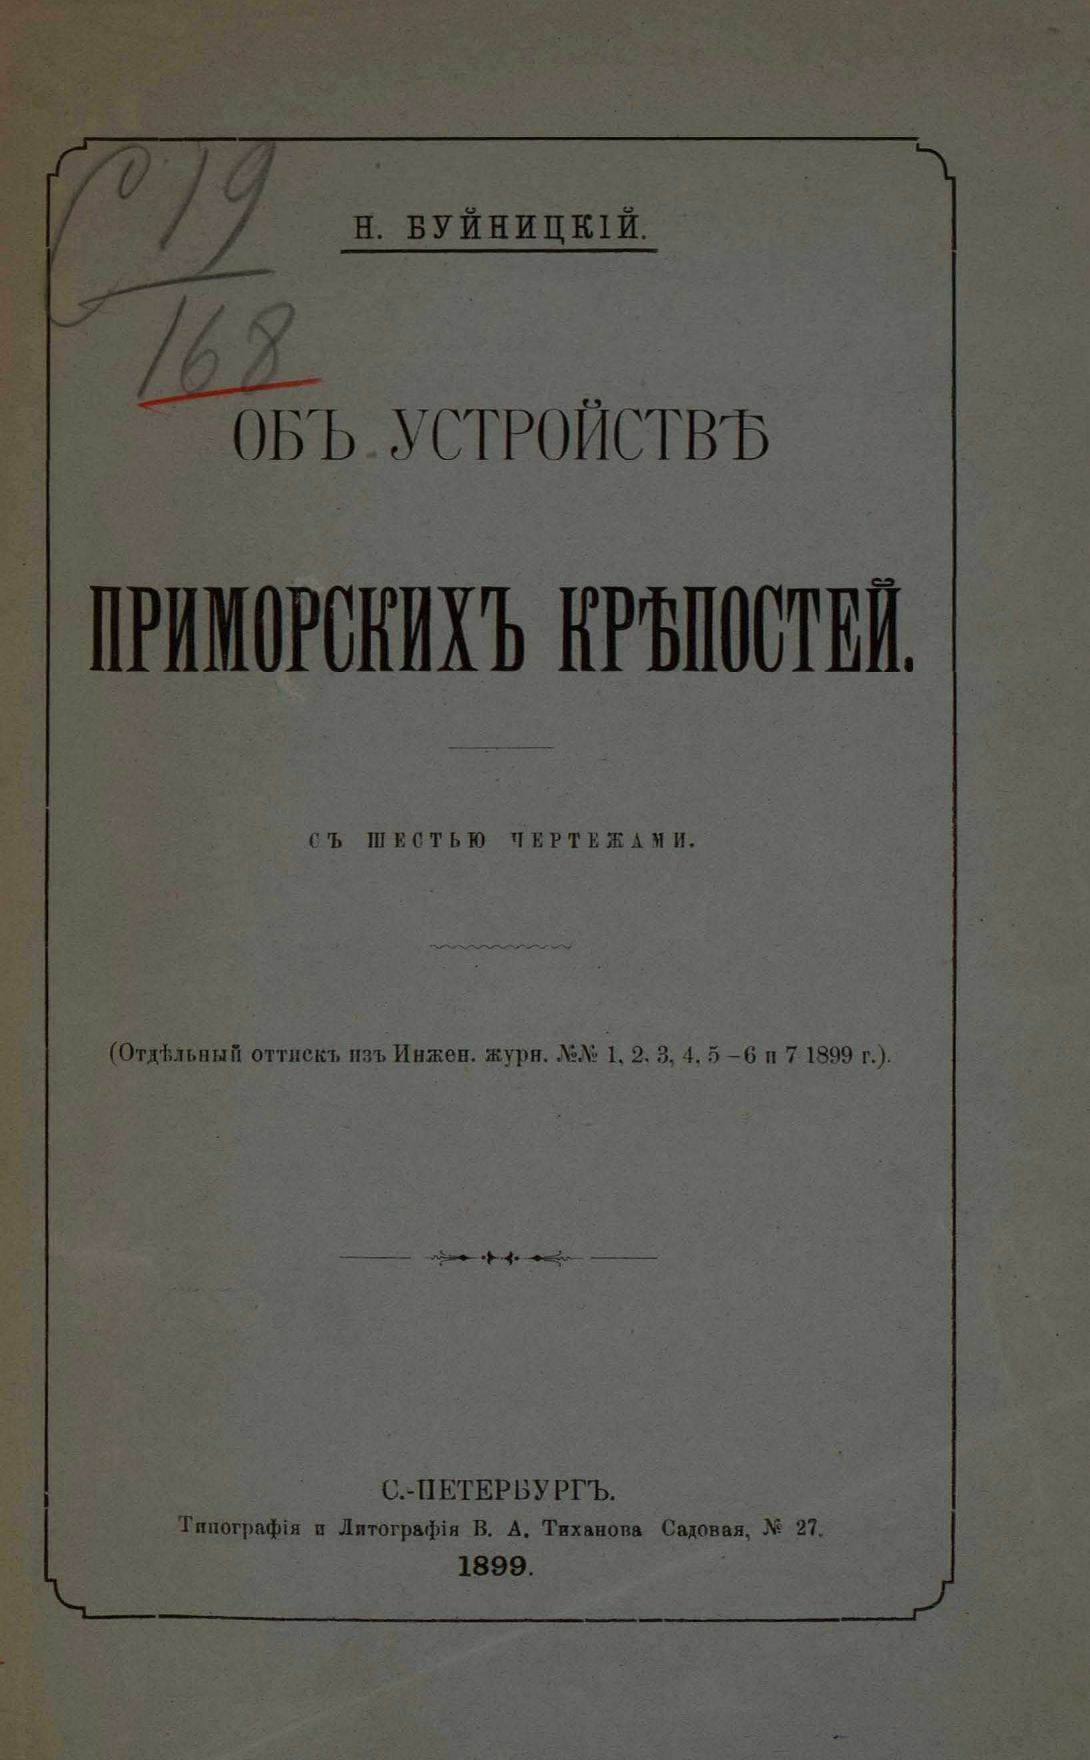 buinitckii-ob-ustroistve-primorskikh-krepostei-1899_Page5.jpg